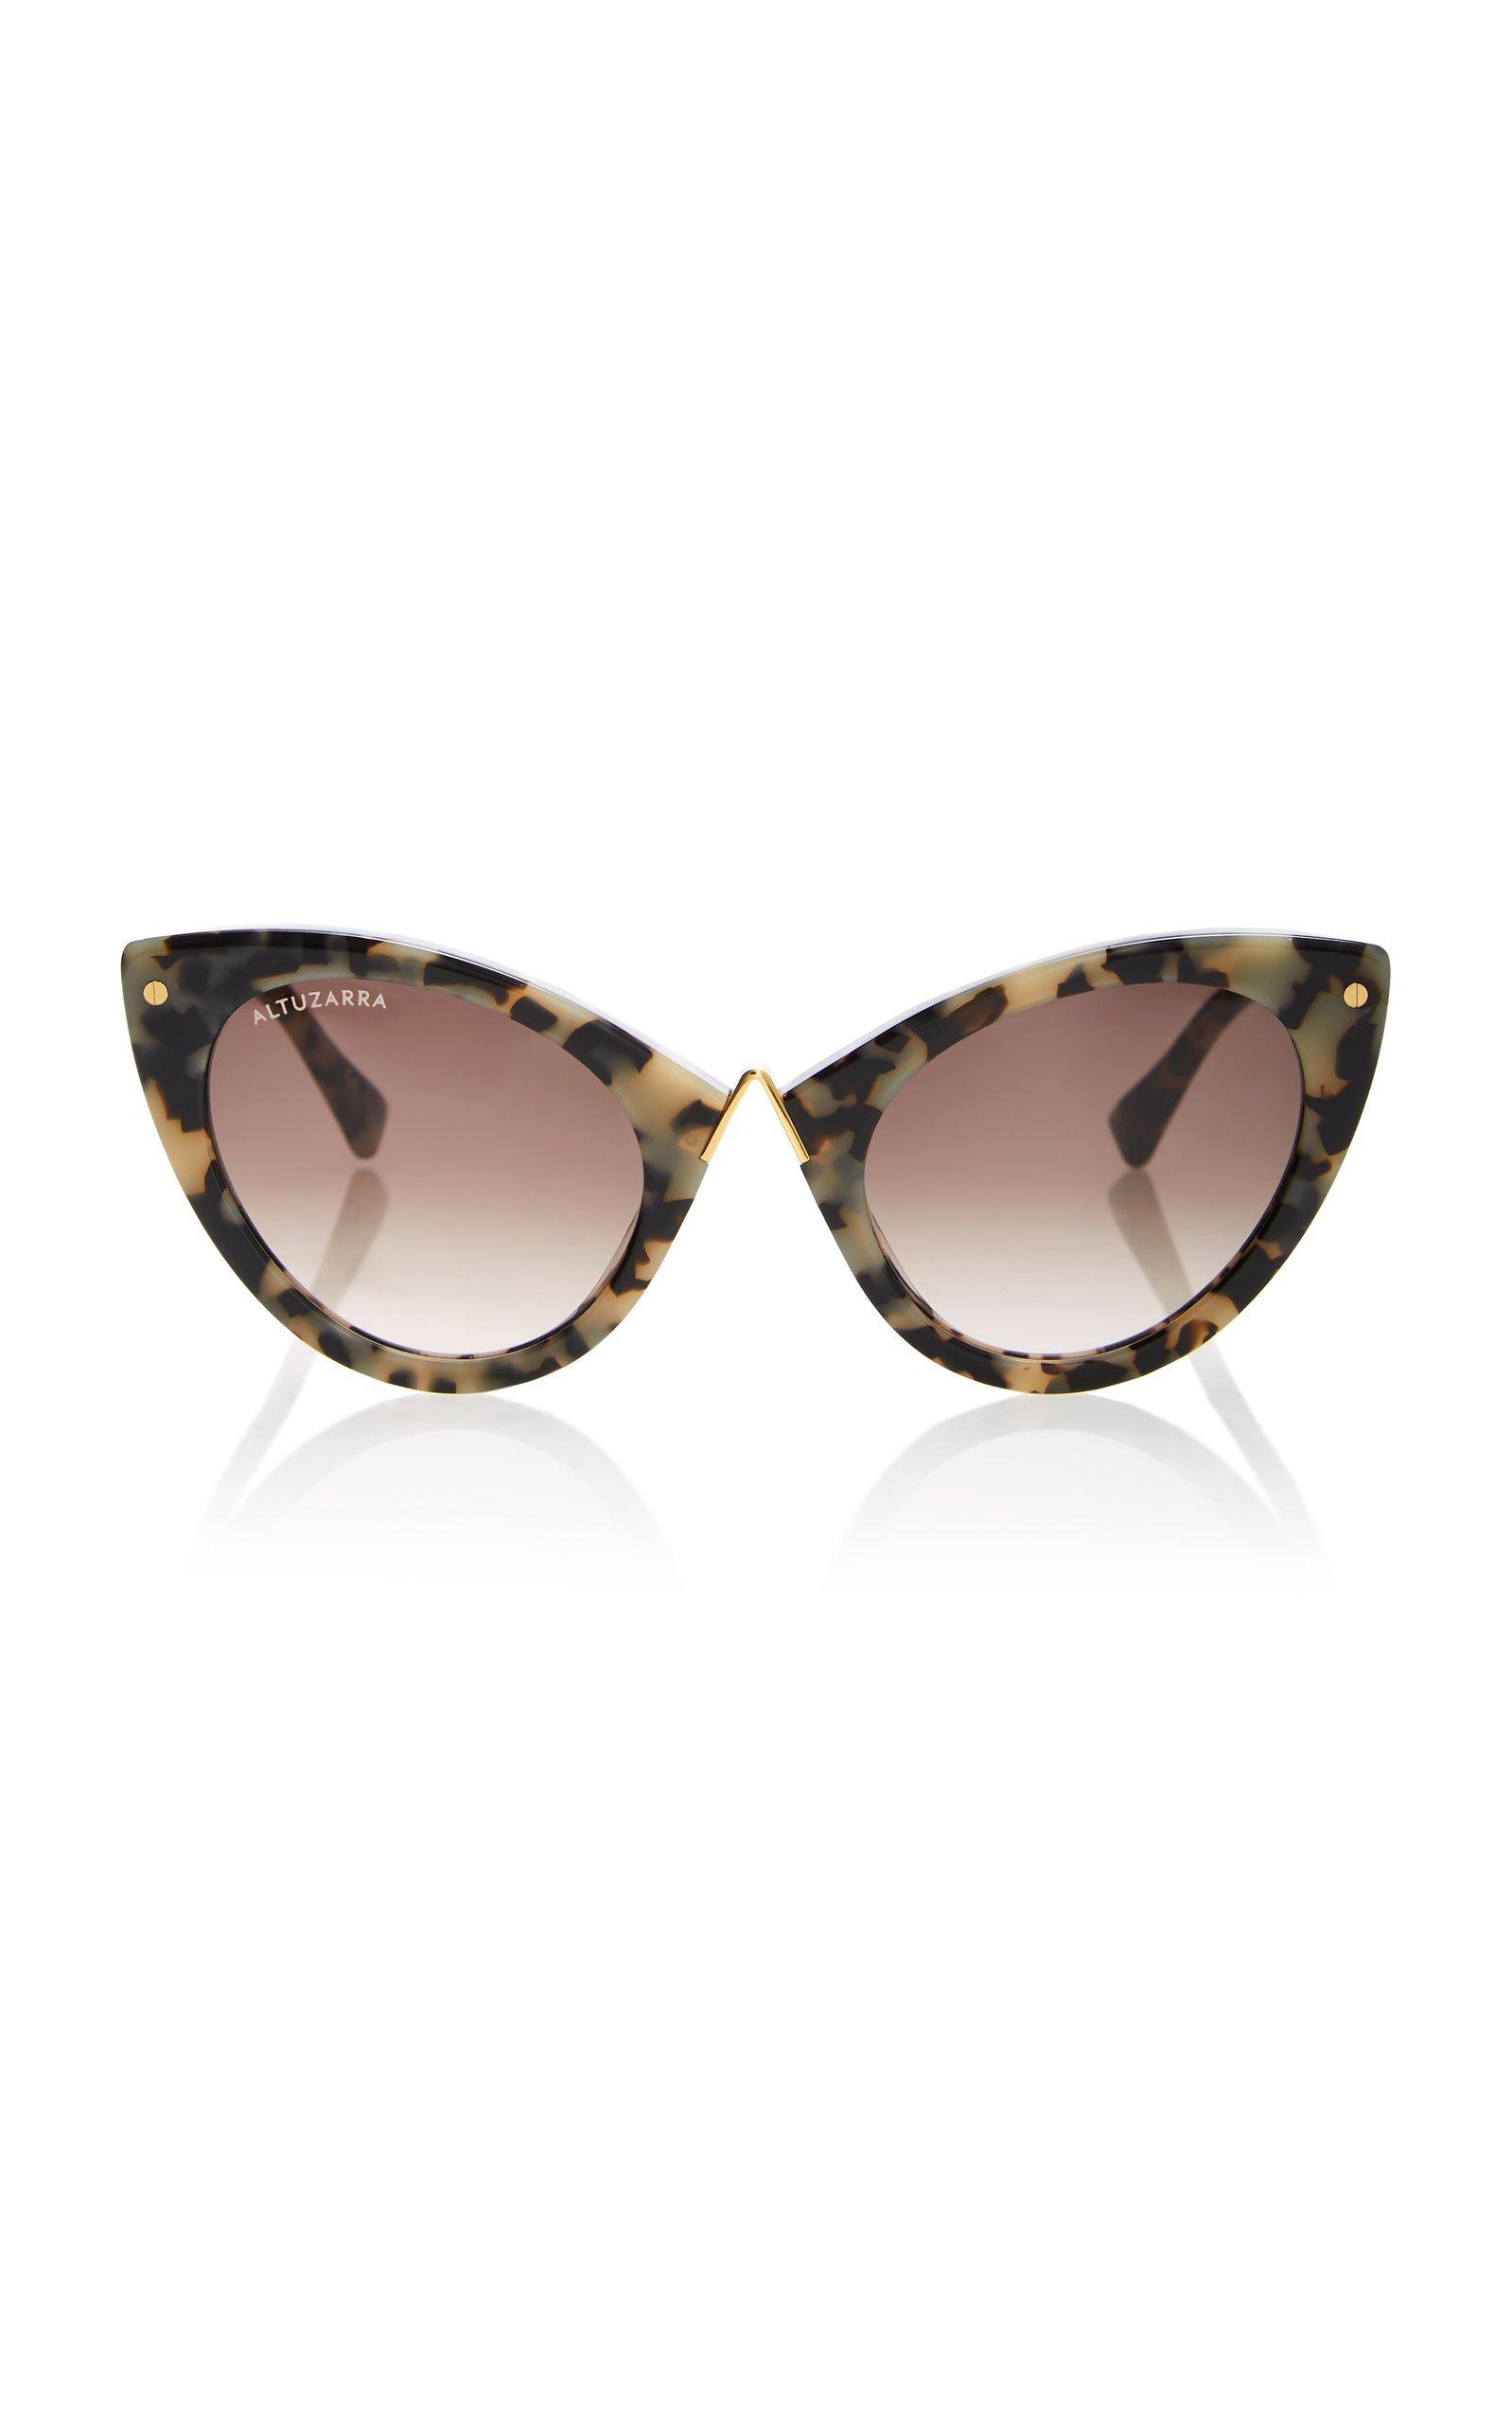 Altuzarra sunglasses Tortoiseshell Acetate Cat-Eye Sunglasses